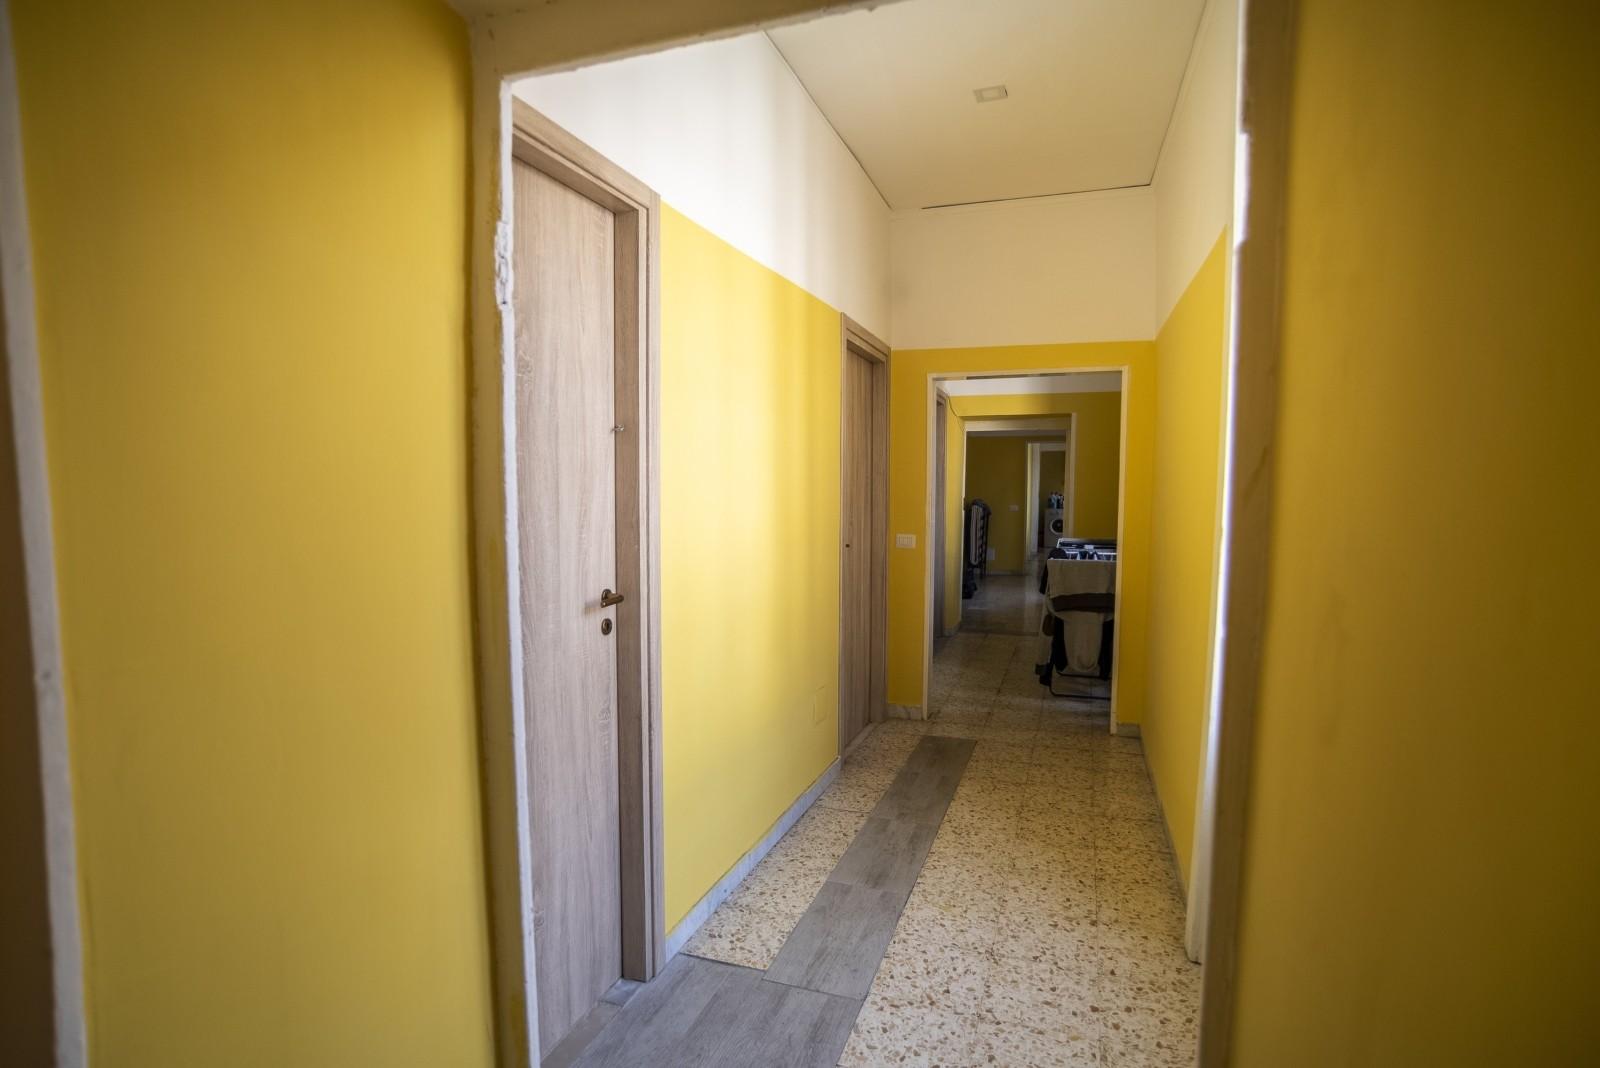 belvedere corridoio